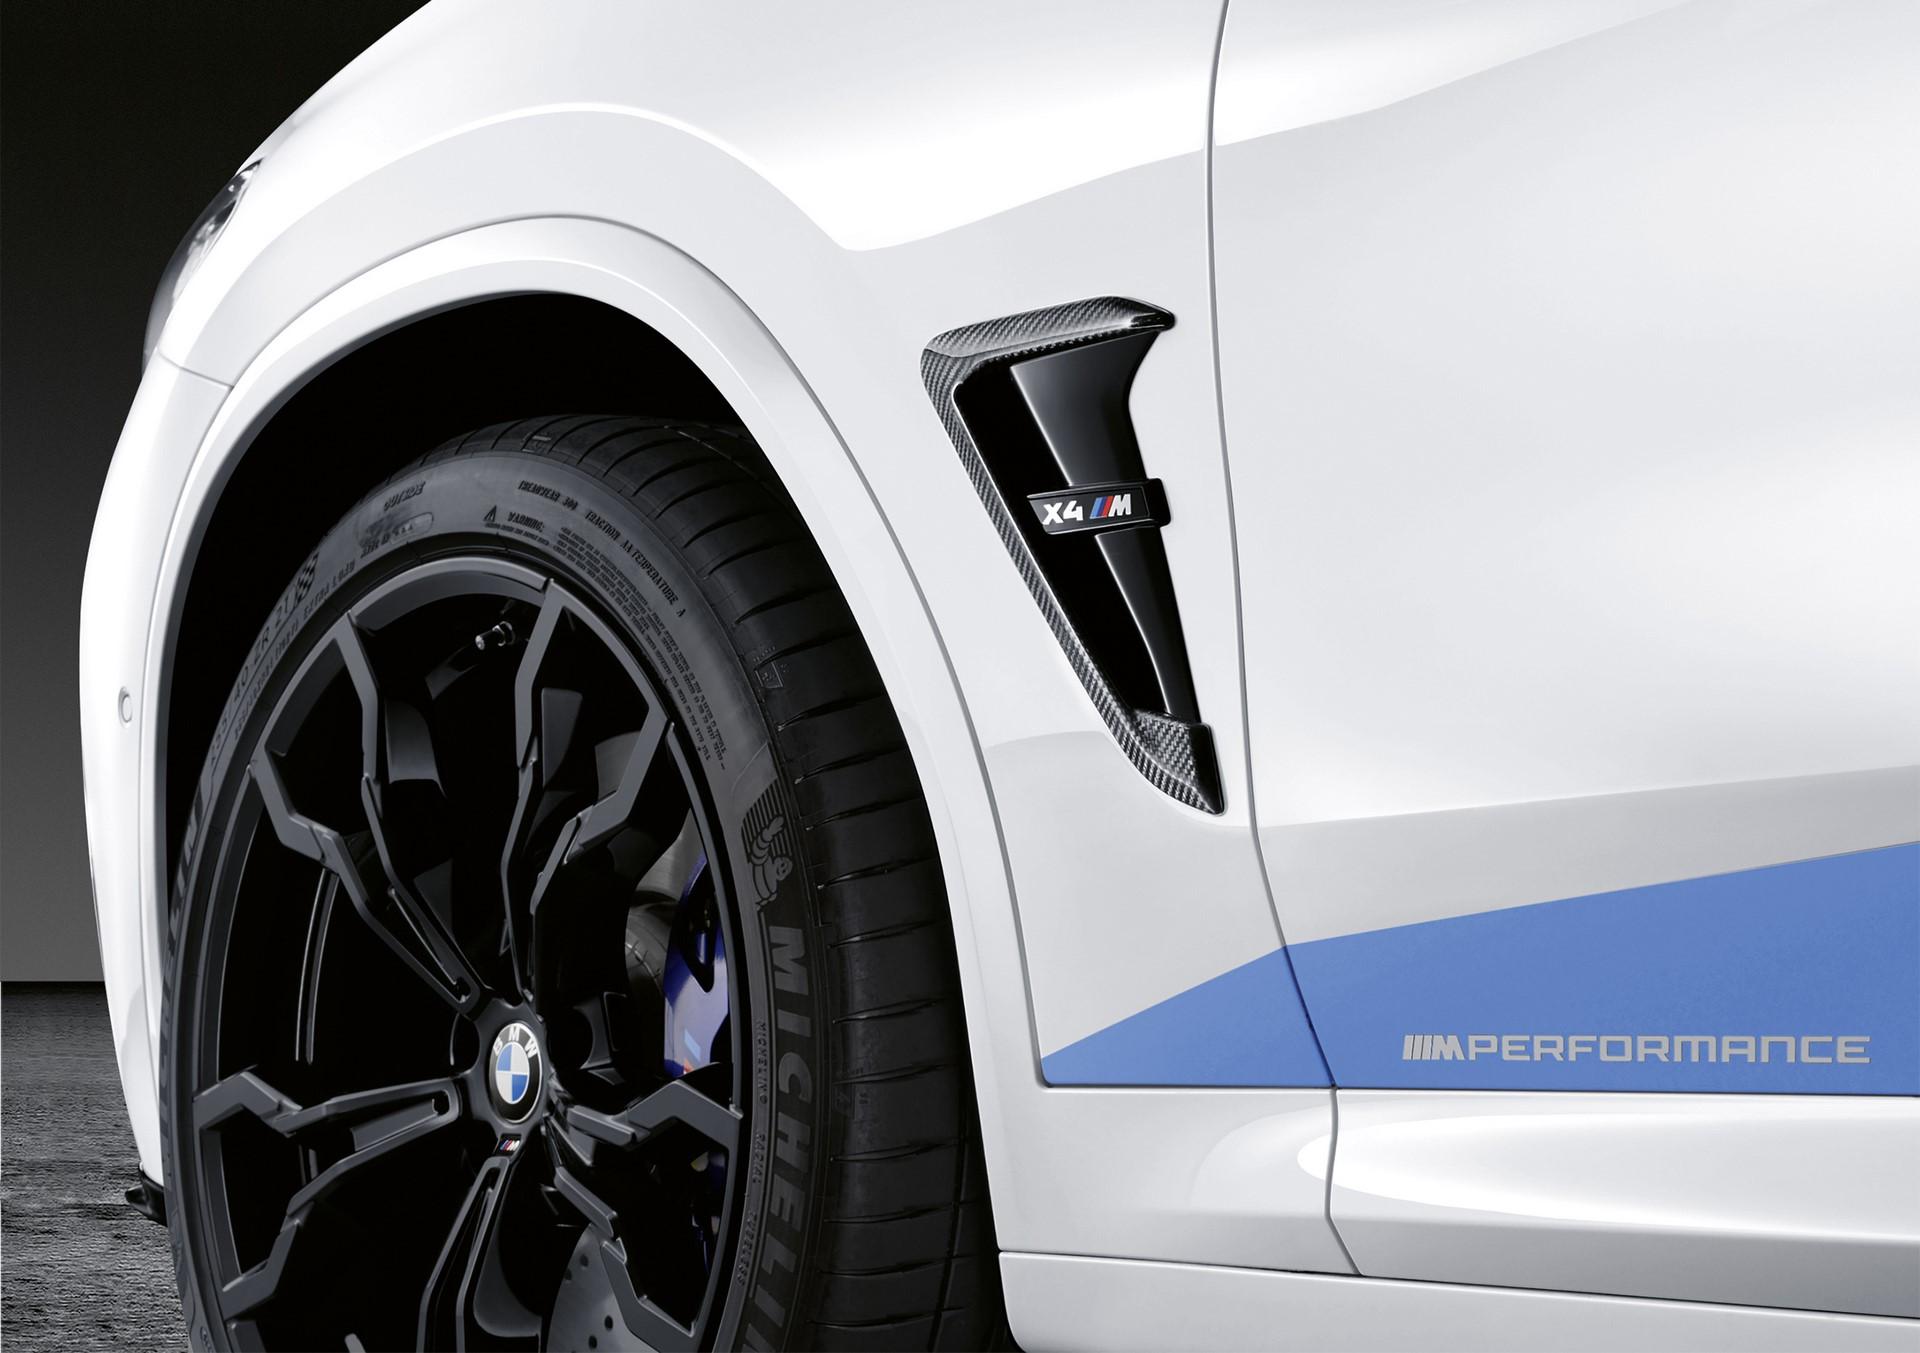 BMW-X3-M-and-BMW-X4-M-M-Performance-Parts-7